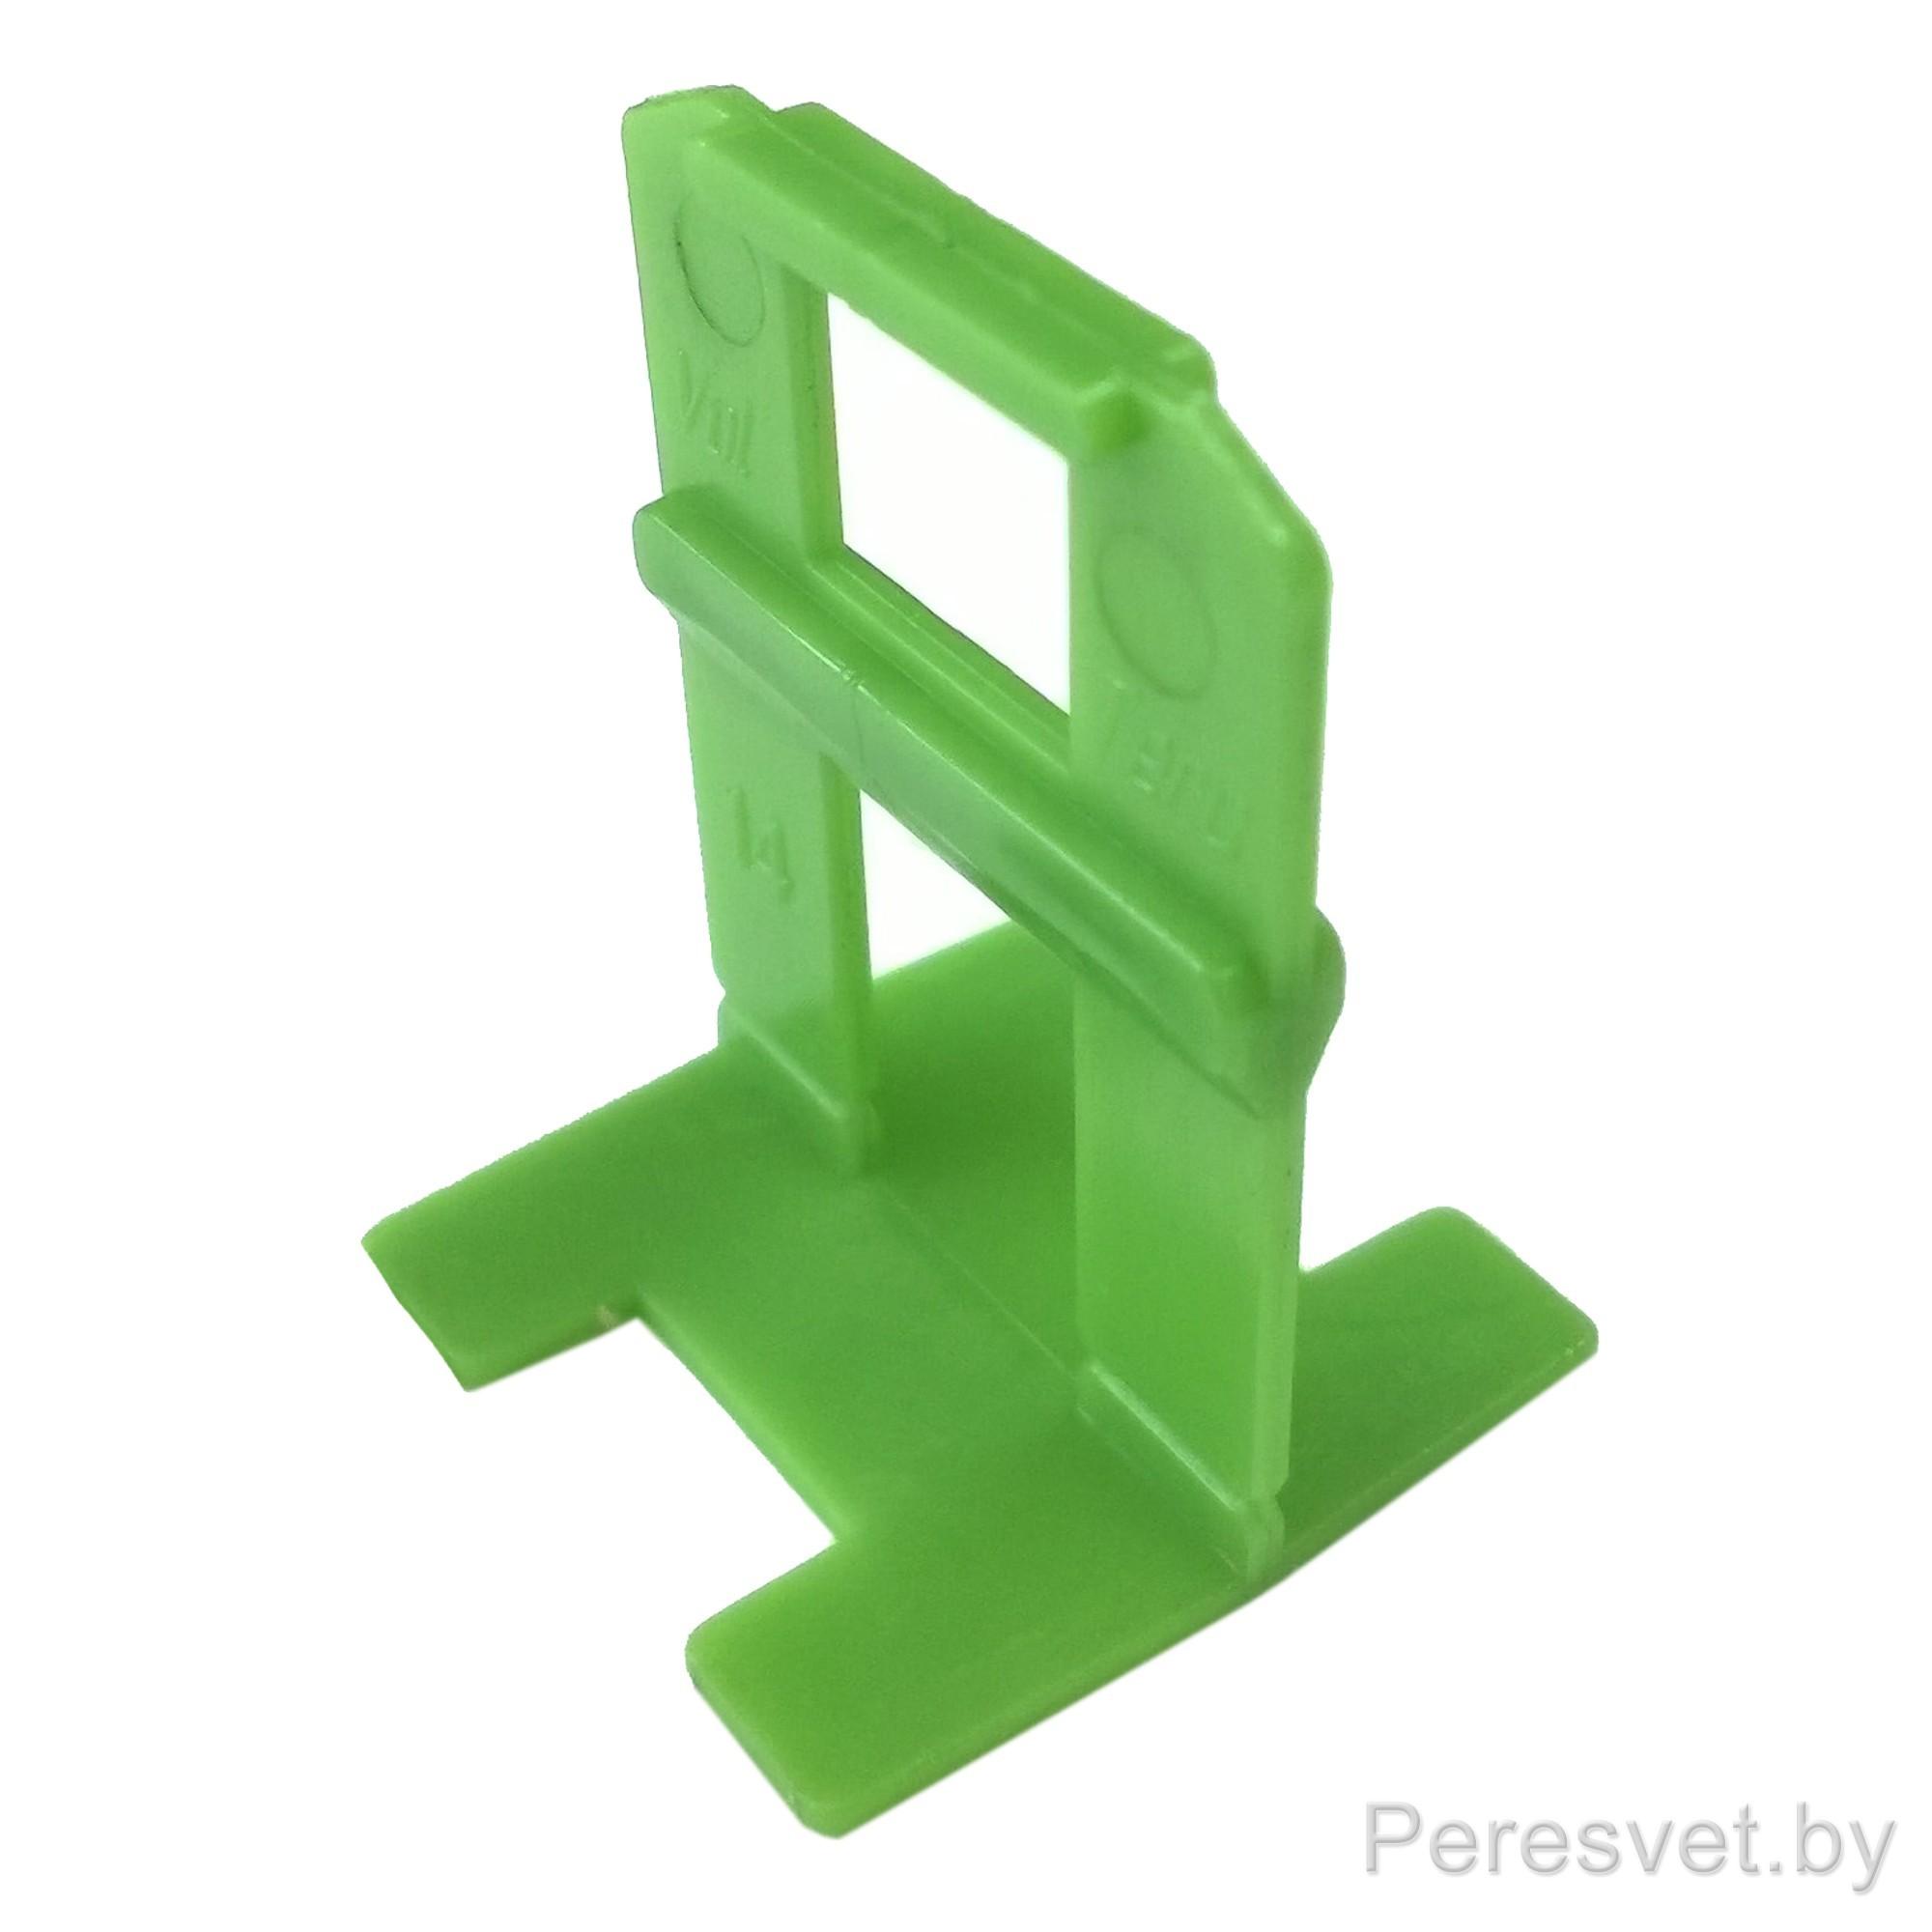 Система выравнивания плитки зажим (100 шт.) на peresvet.by